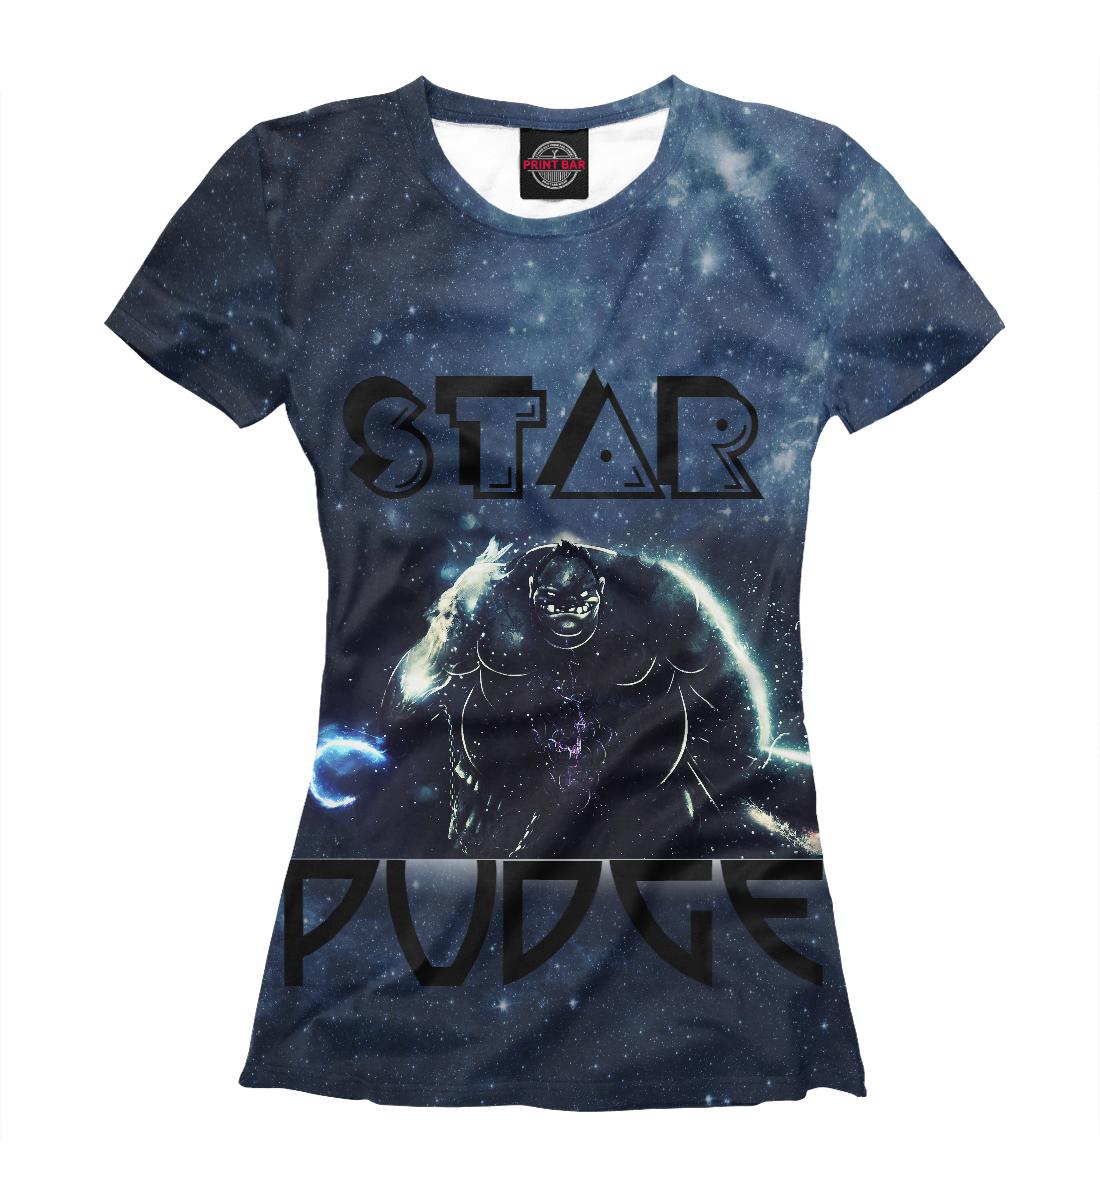 Купить Звёздный Пудж (Star Pudge), Printbar, Футболки, DO2-935955-fut-1